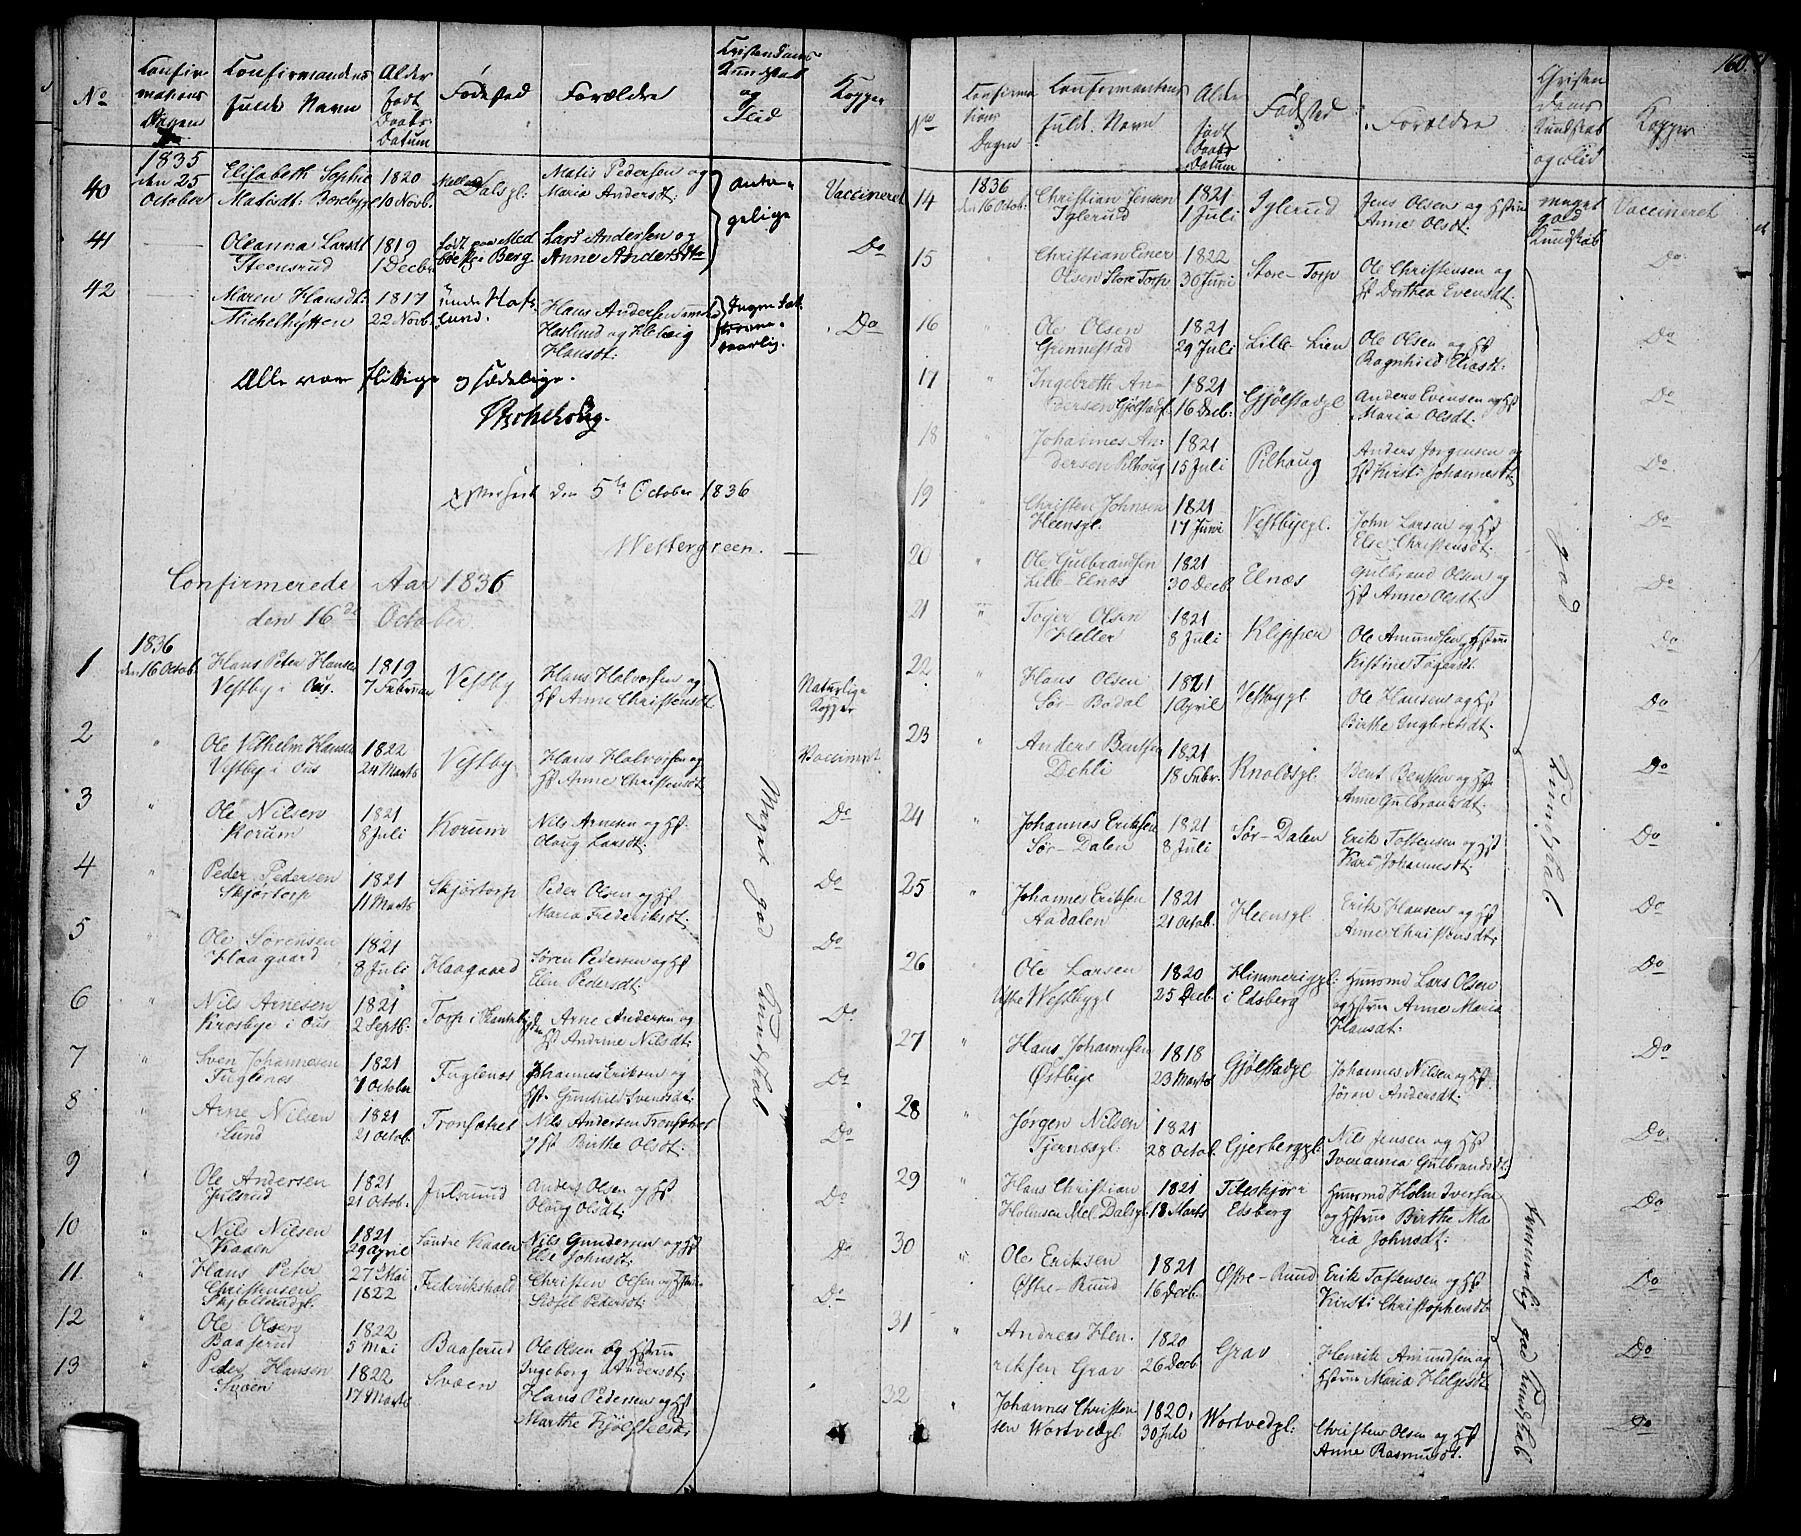 SAO, Rakkestad prestekontor Kirkebøker, F/Fa/L0007: Ministerialbok nr. I 7, 1825-1841, s. 160